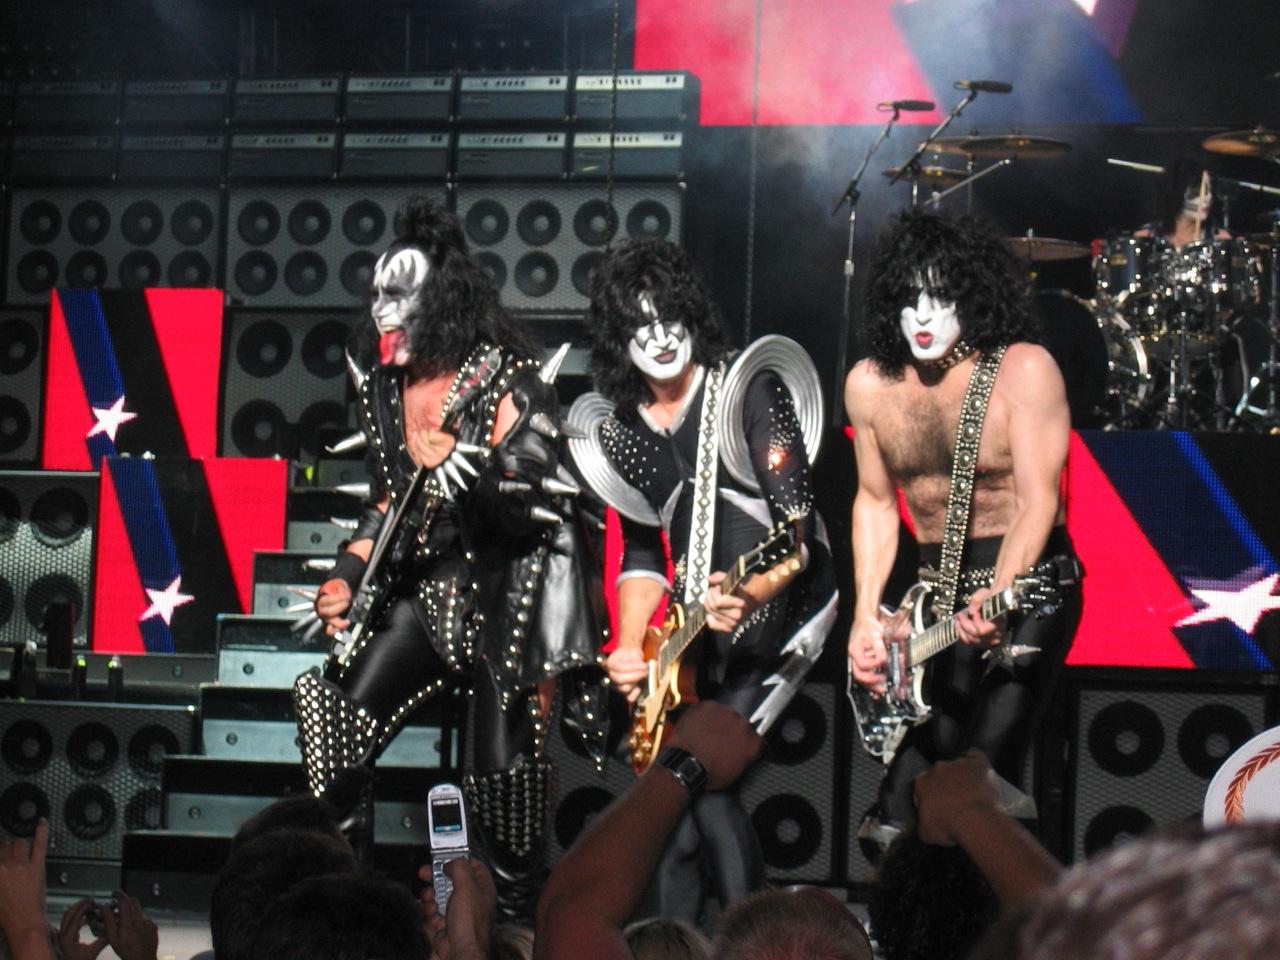 Fondos de escritorio Kiss_picture